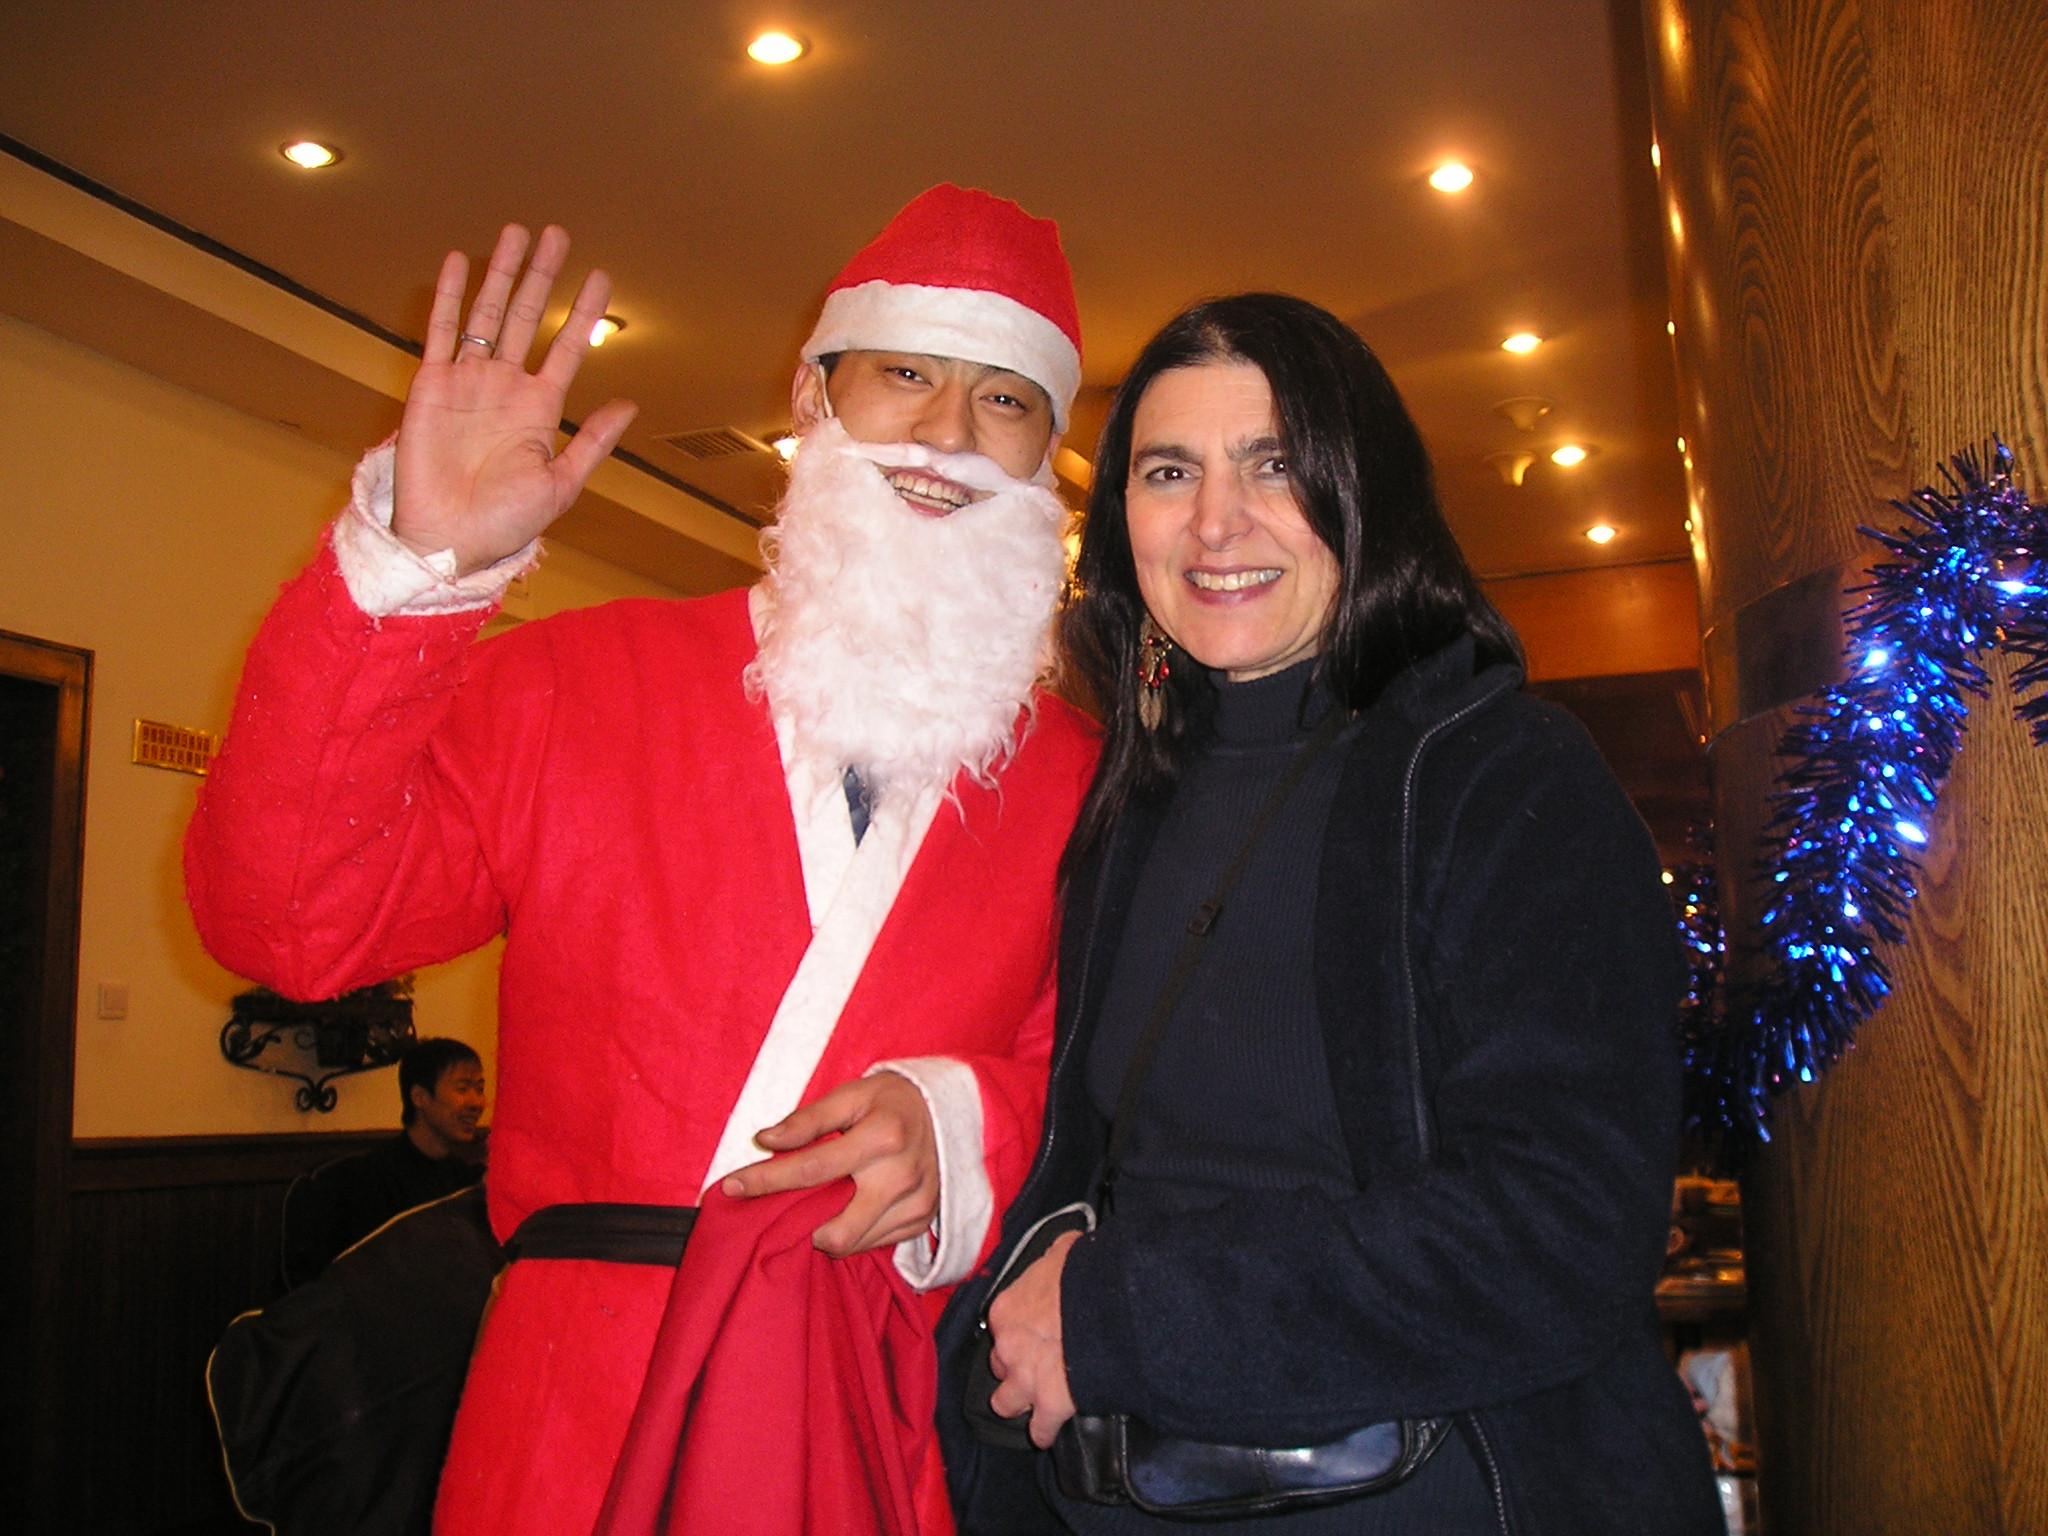 Ramona McKean and Santa server at Hans Beer BBQ in Harbin, Christmas 2004